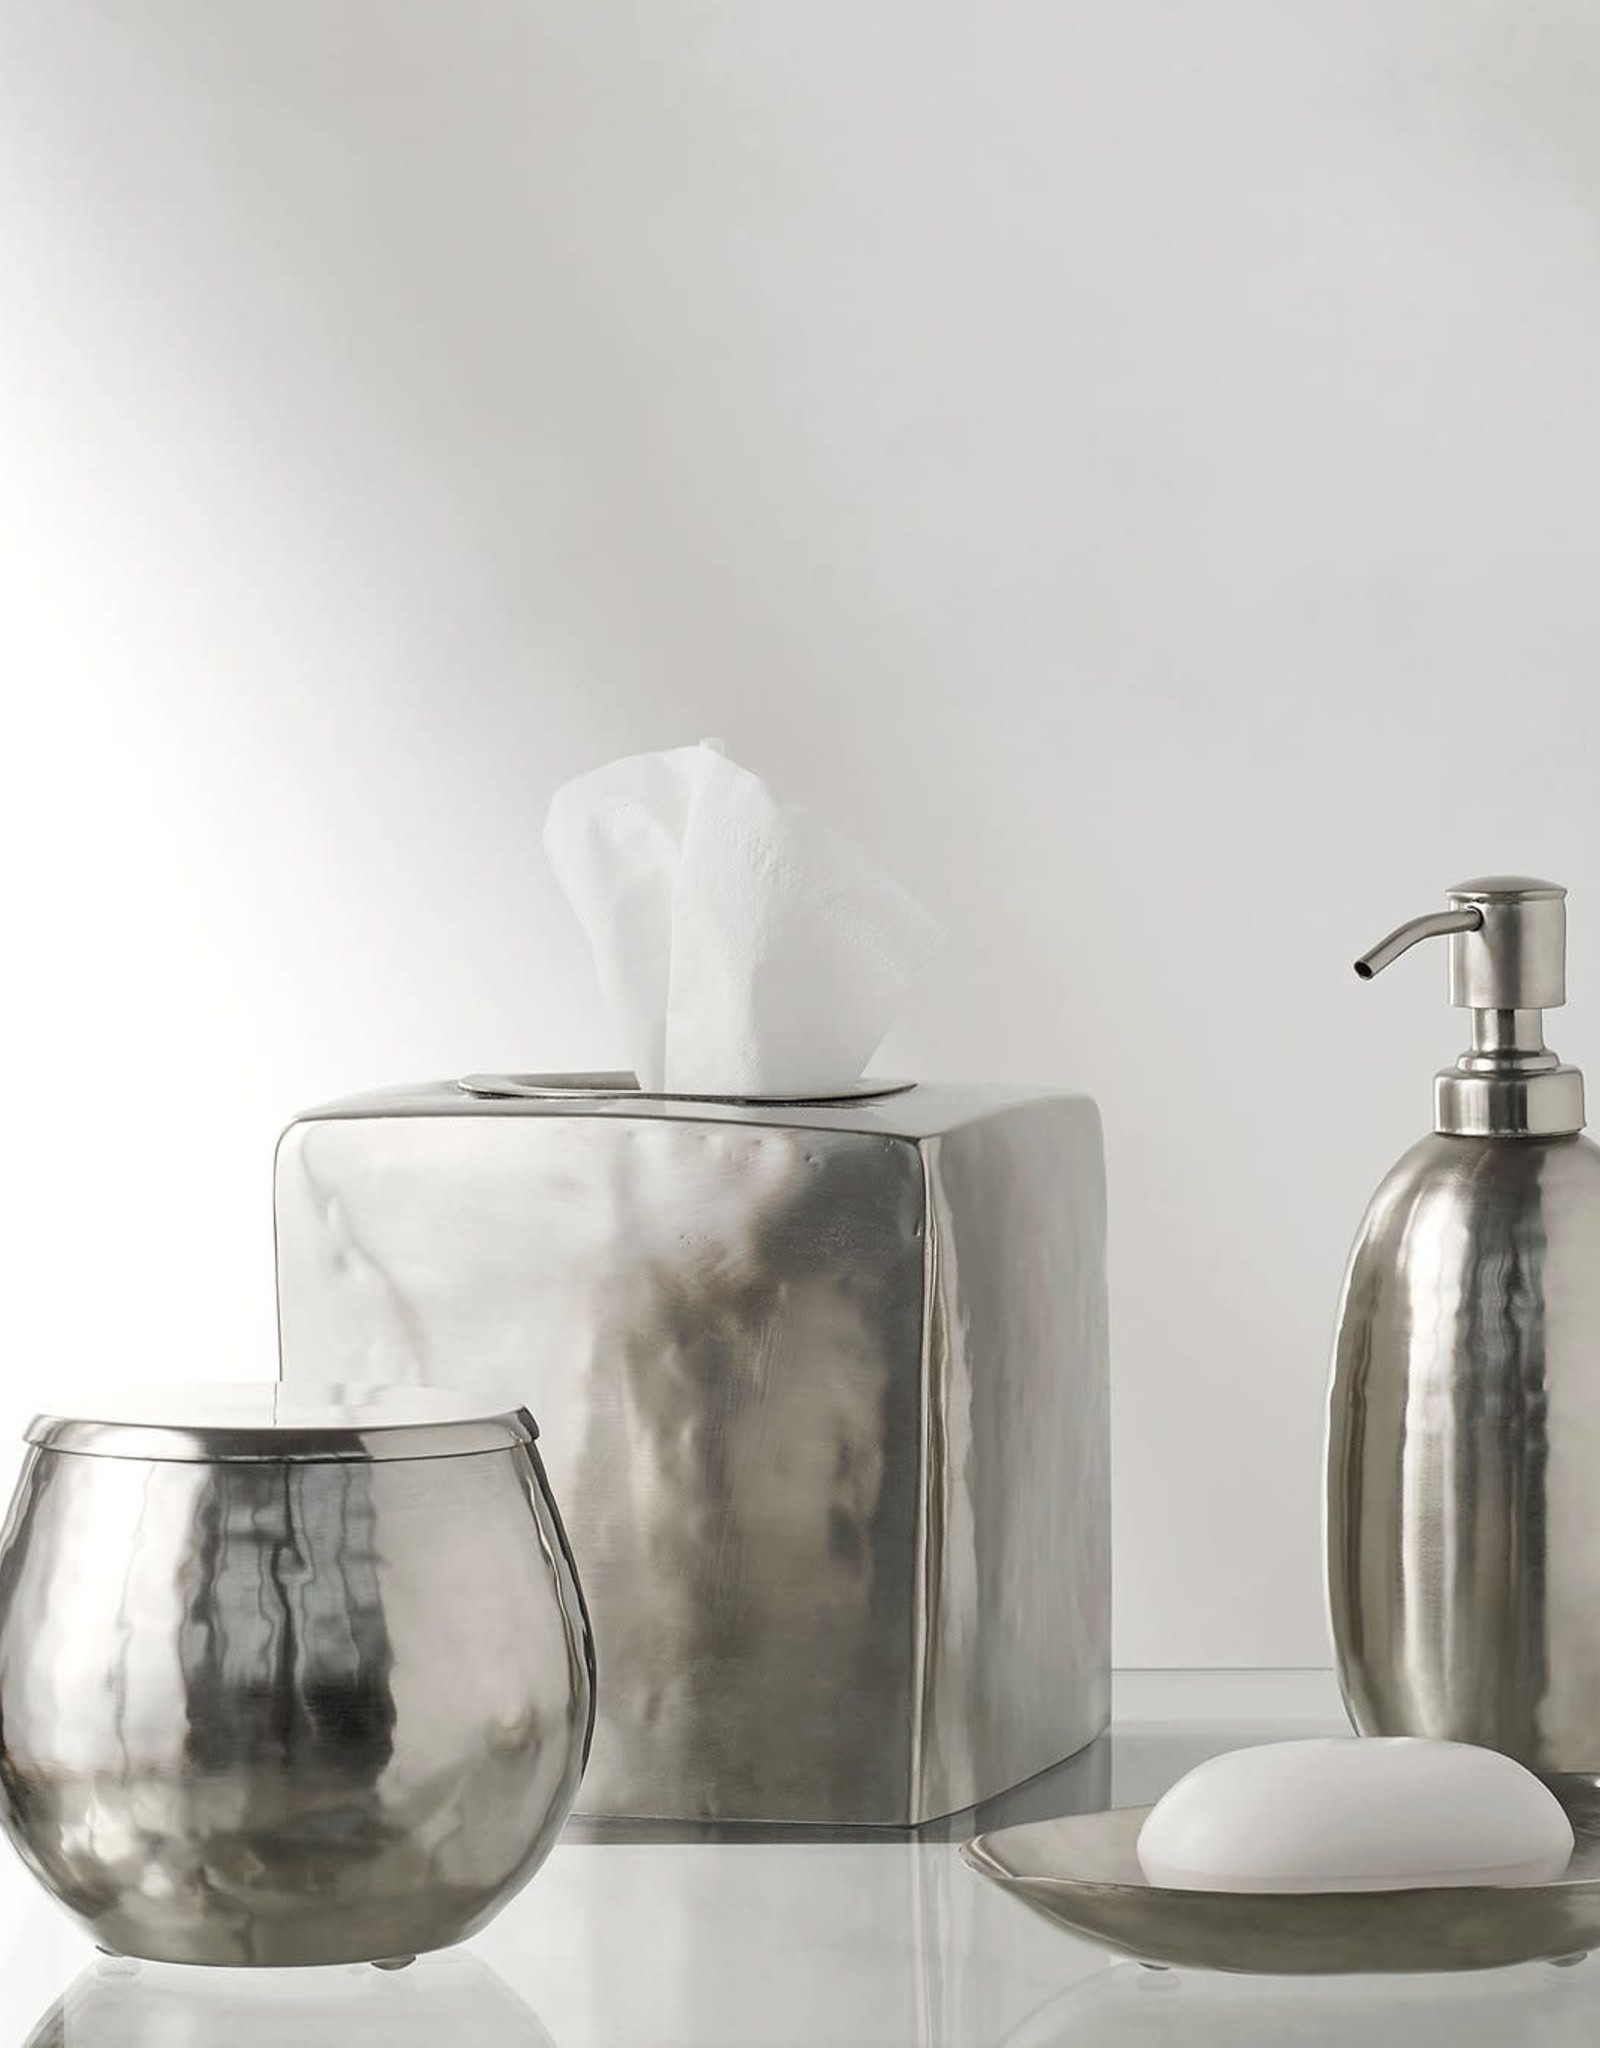 Kassatex Nile Silver Bath Accessories